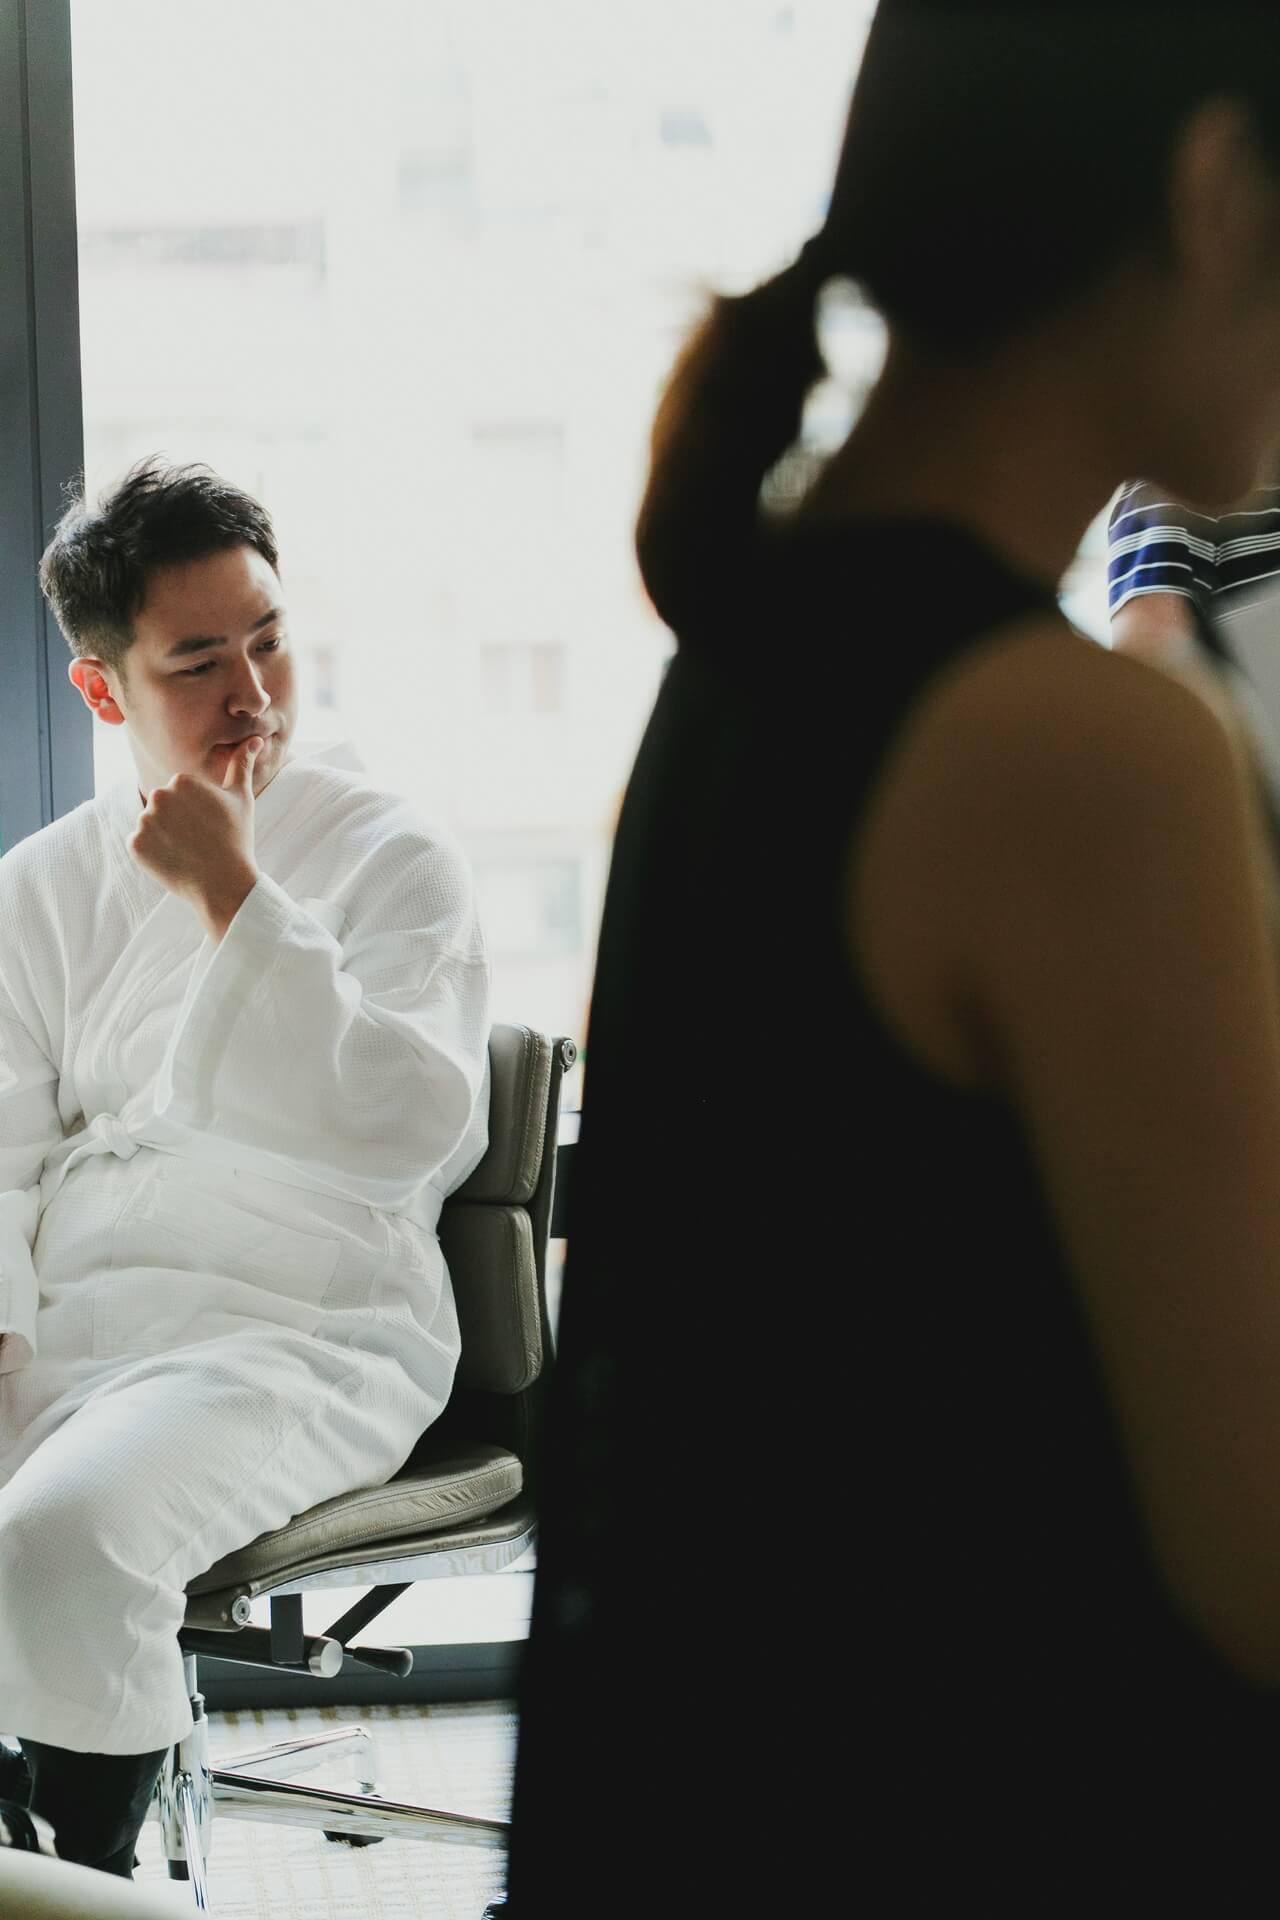 misslala 婚禮紀錄 婚禮紀實 韓國婚禮 萬豪婚禮 萬豪儀式 推薦婚攝 底片風格 電影風格 -0014.jpg